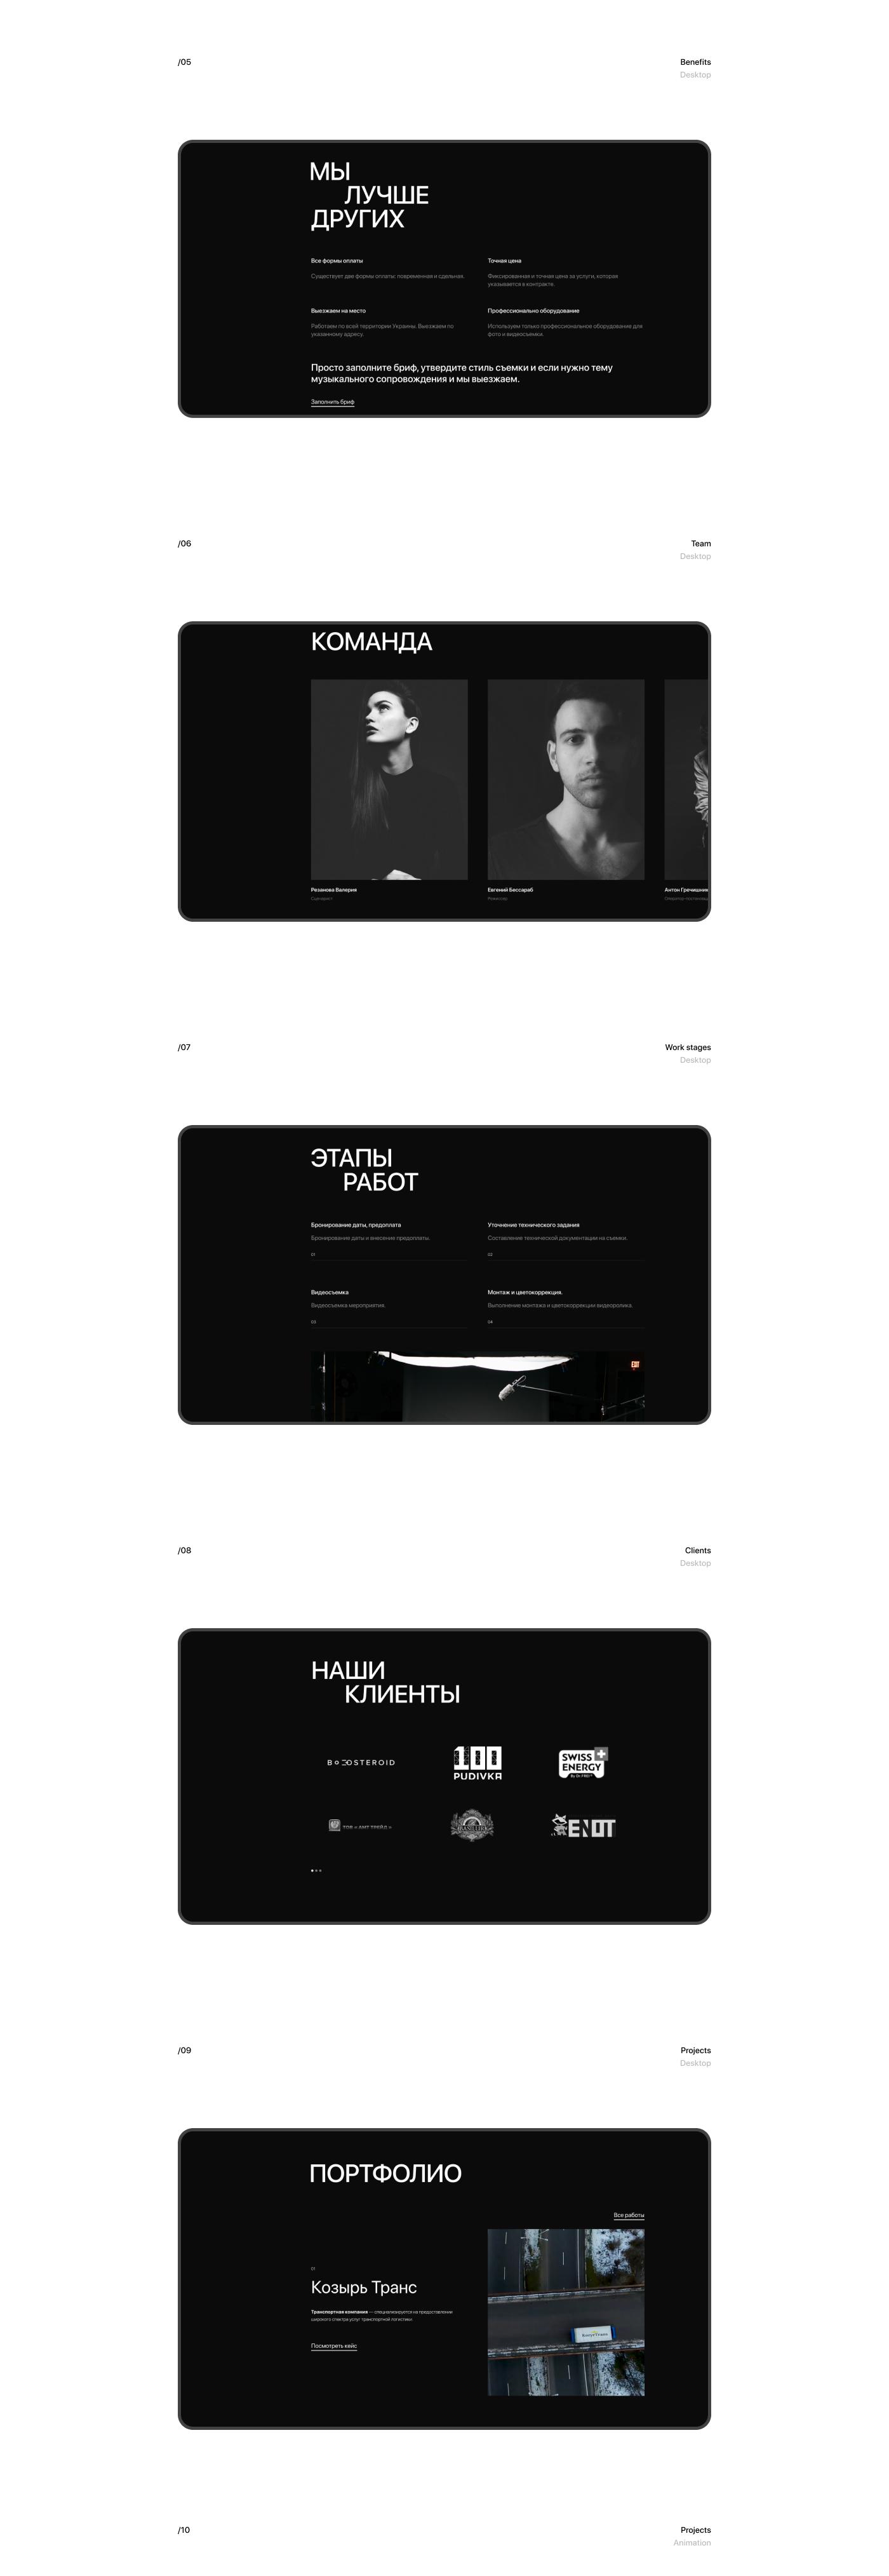 Adobe XD Adobe Photoshop adobe media agency UI ux UI/UX Web Design  Webdesign